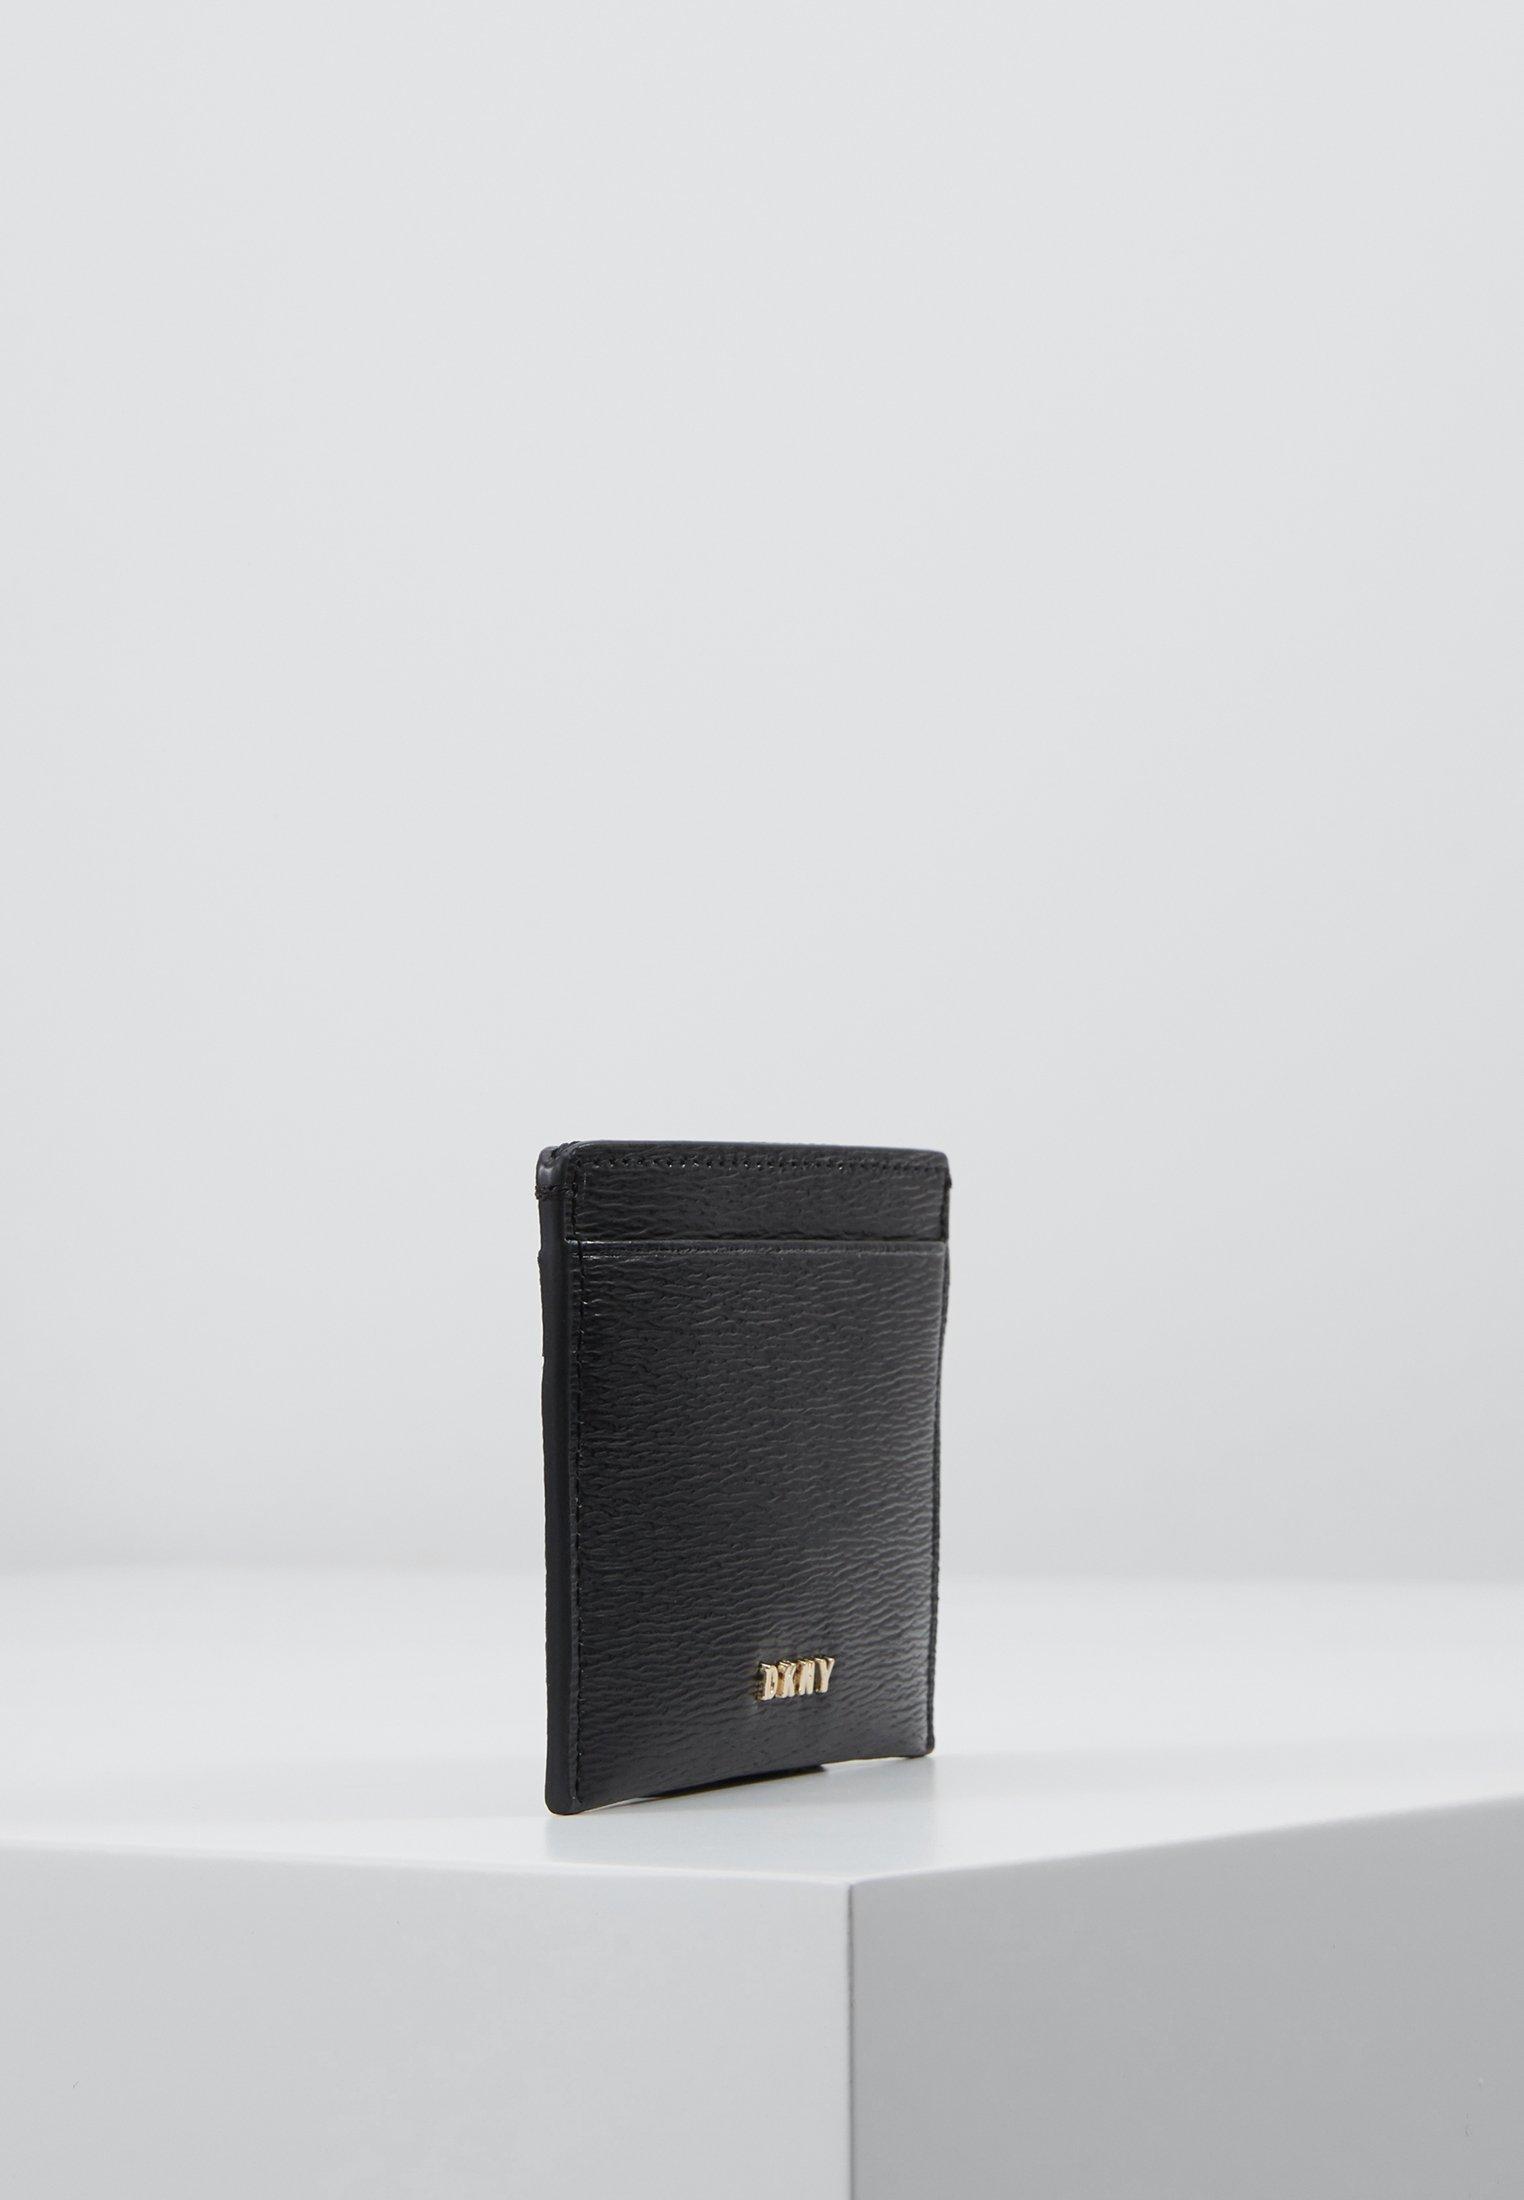 DKNY PERLA ENVELOPE FLAP - Lommebok - black/gold-coloured/svart kWMs02dUI55H3cp